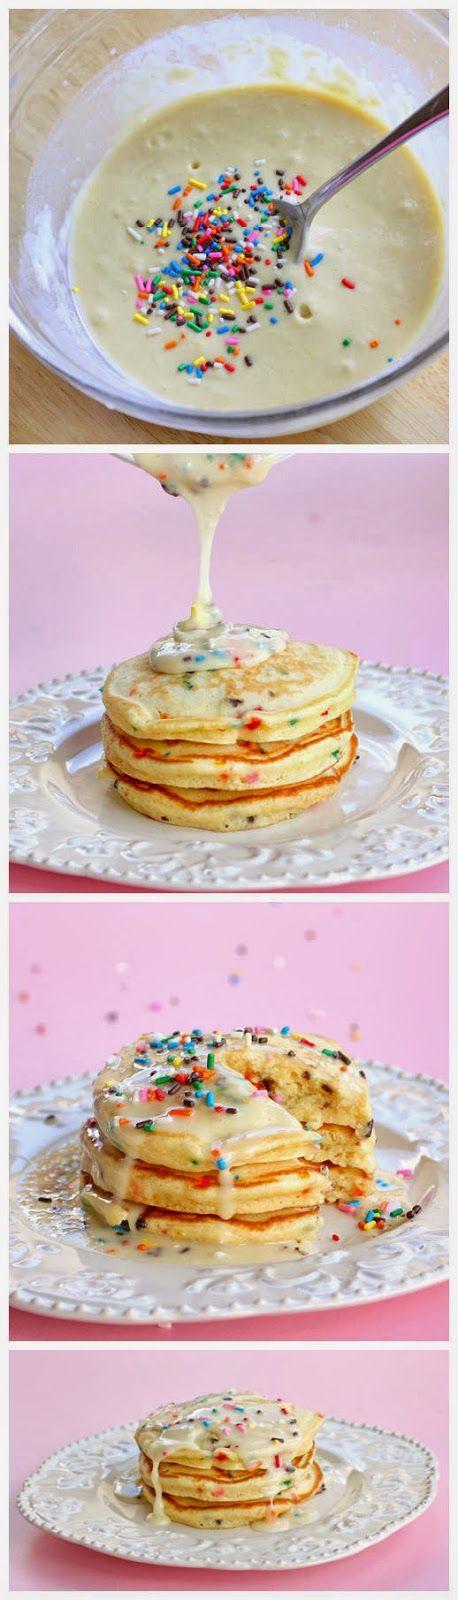 Cake Batter Pancakes Ingredients 1 1/4 cups all purpose flour 1 cup Betty Crocker Supermoist yellow cake mix 1 Tablespoon sugar 3/4 teaspoon baking powder pinch of salt 2 large eggs 1 teaspoon vani…